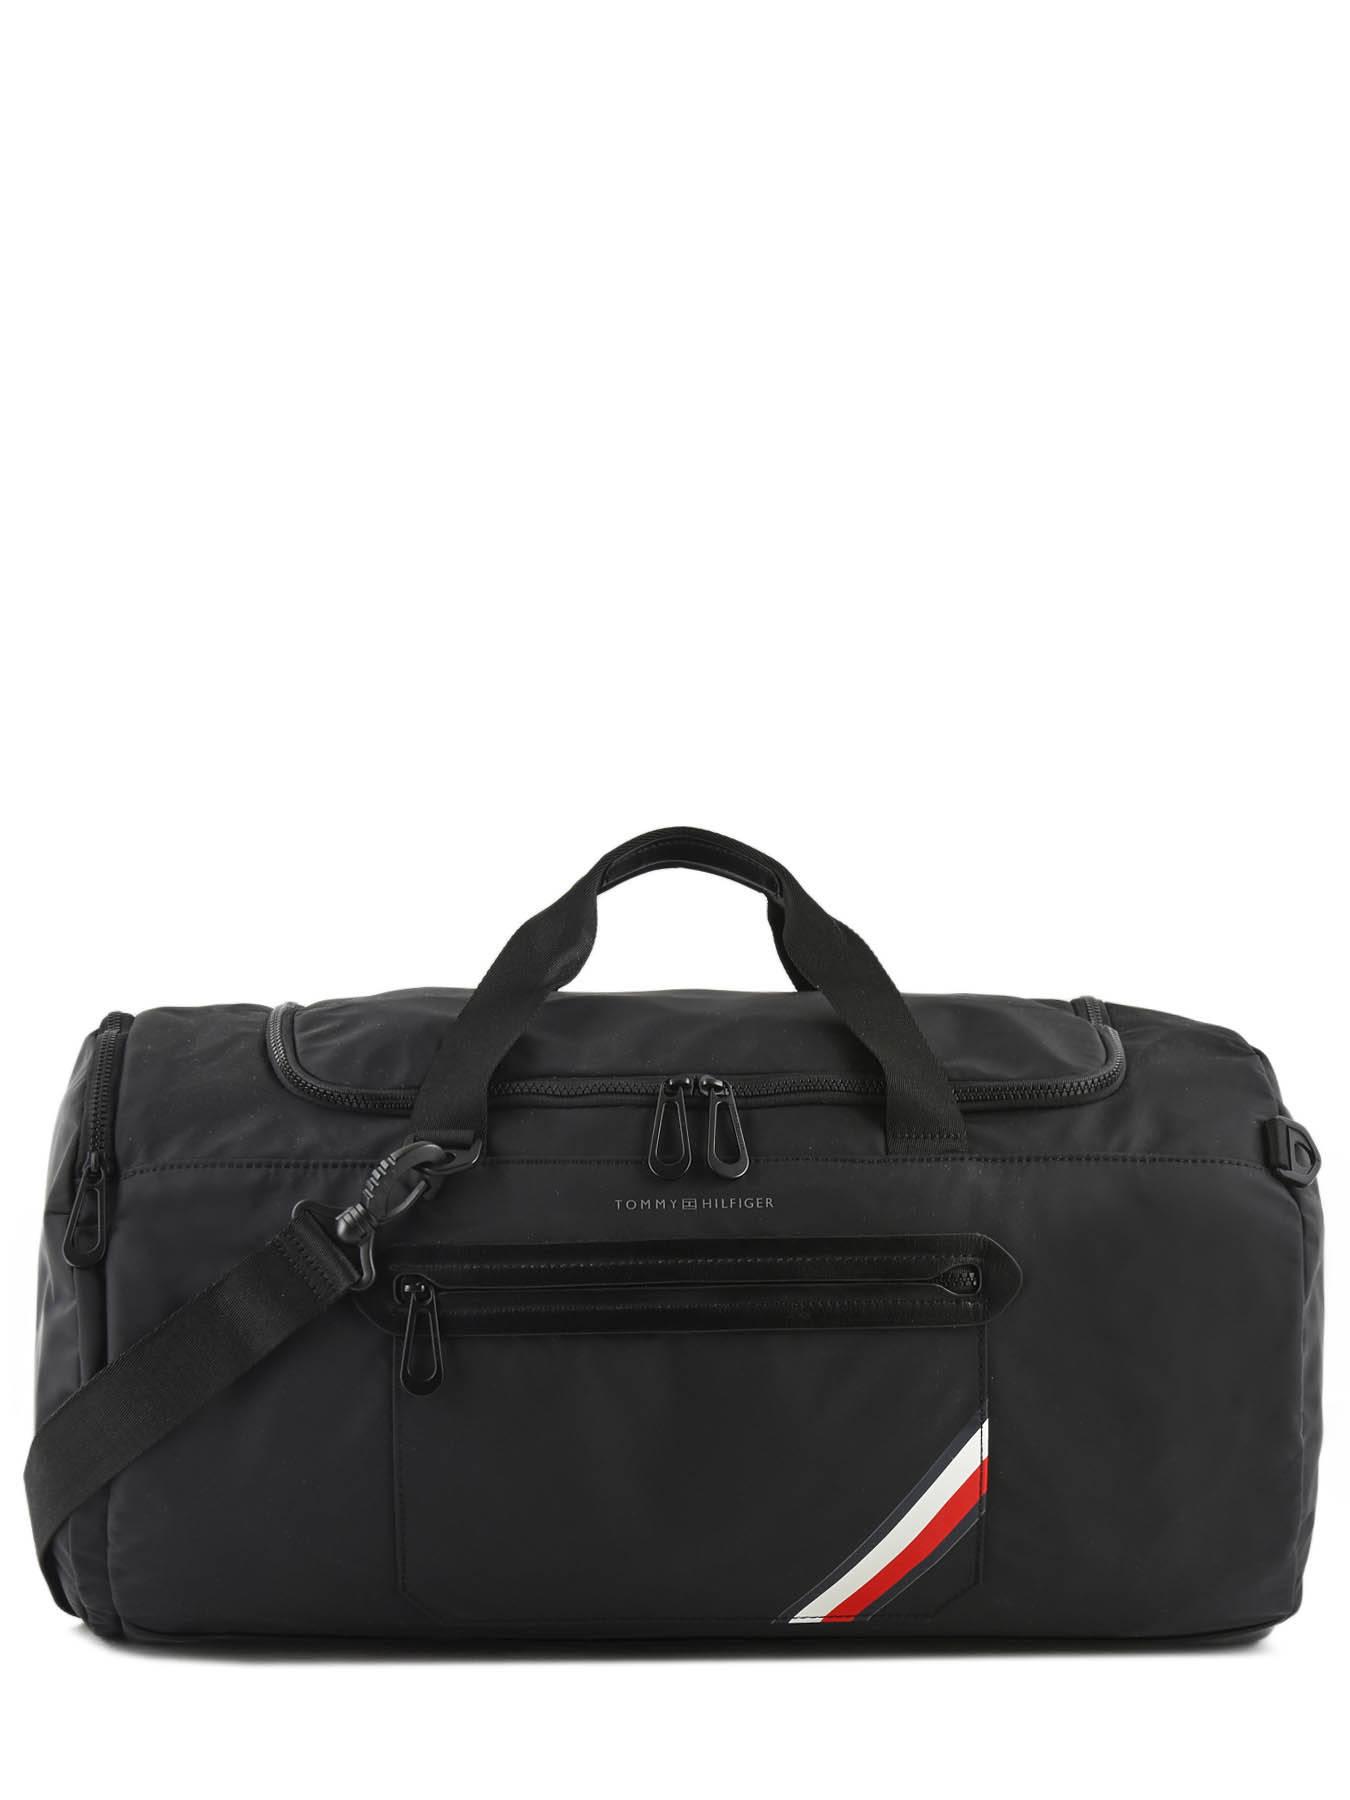 sac de voyage tommy hilfiger